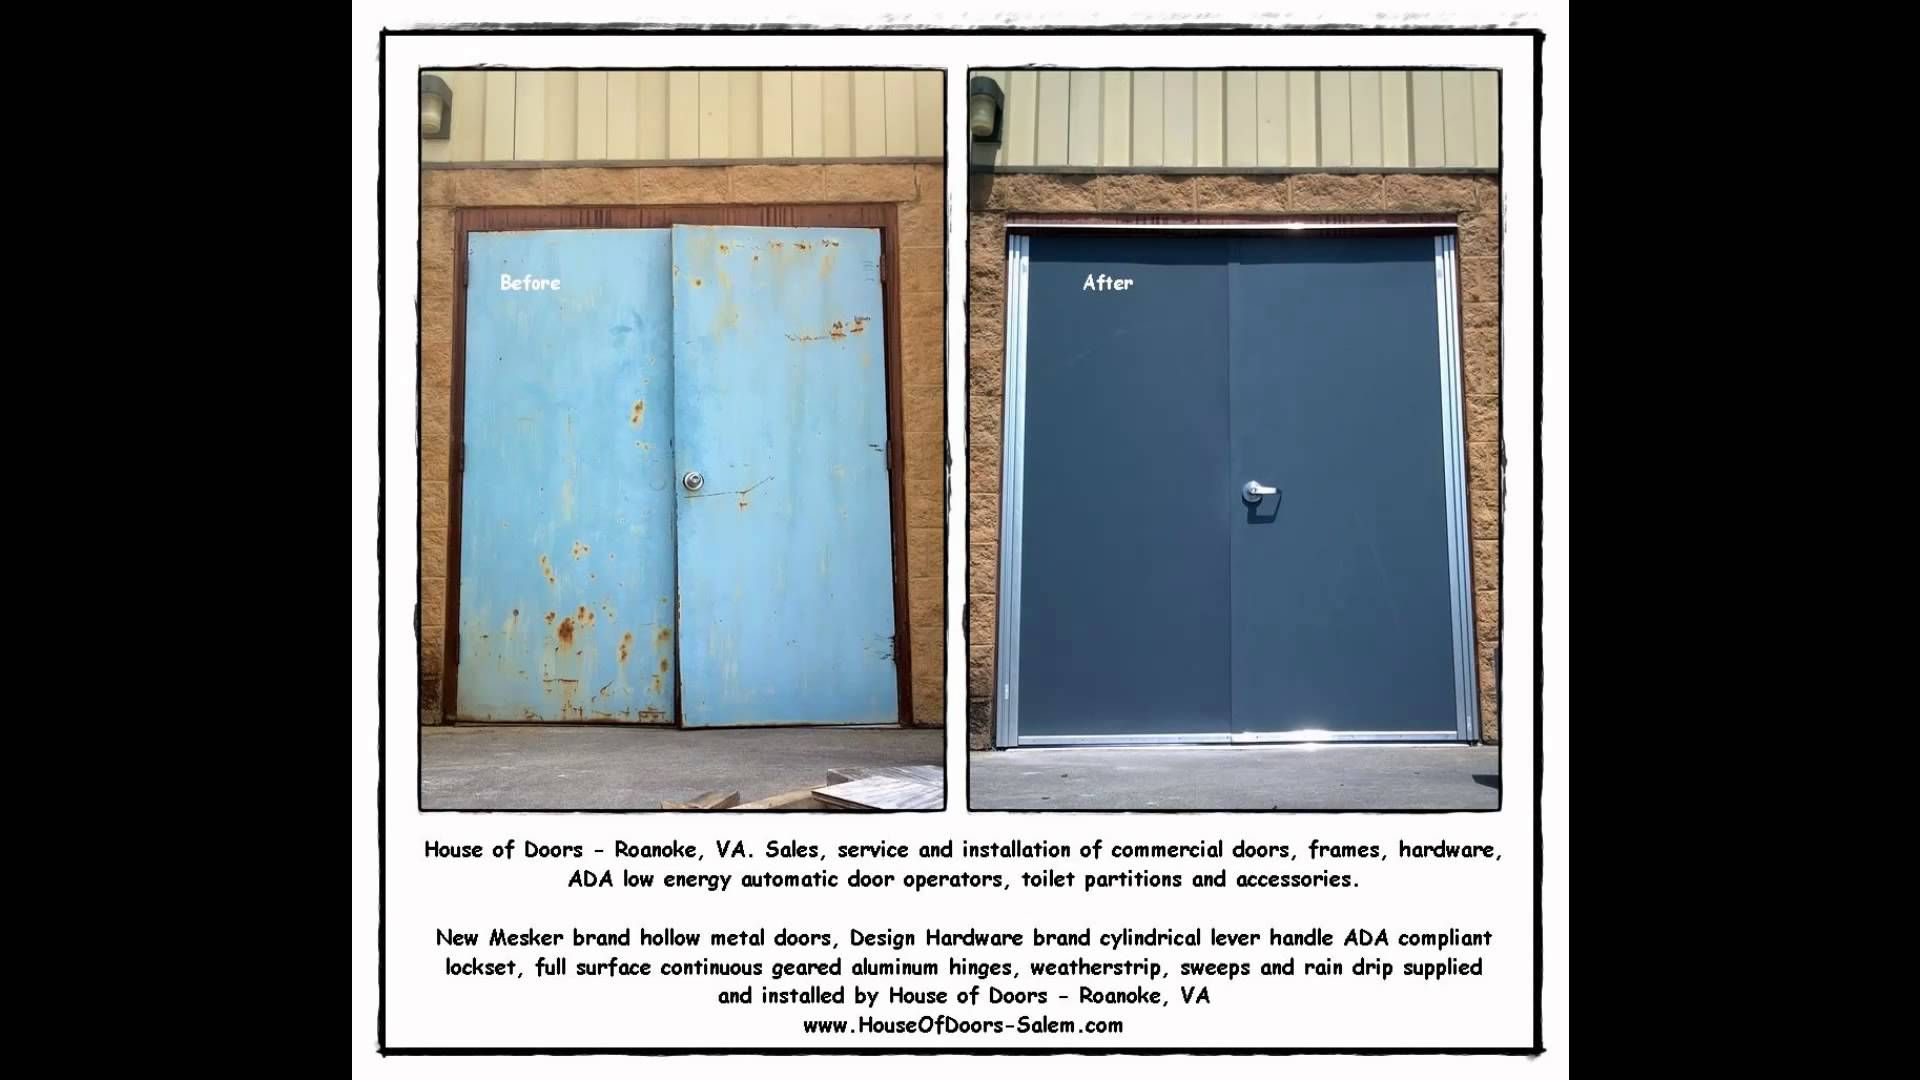 metal hollow throwback house by and installation doors of va repairs it sales roanoke thursdayrepair service repair frame thursday